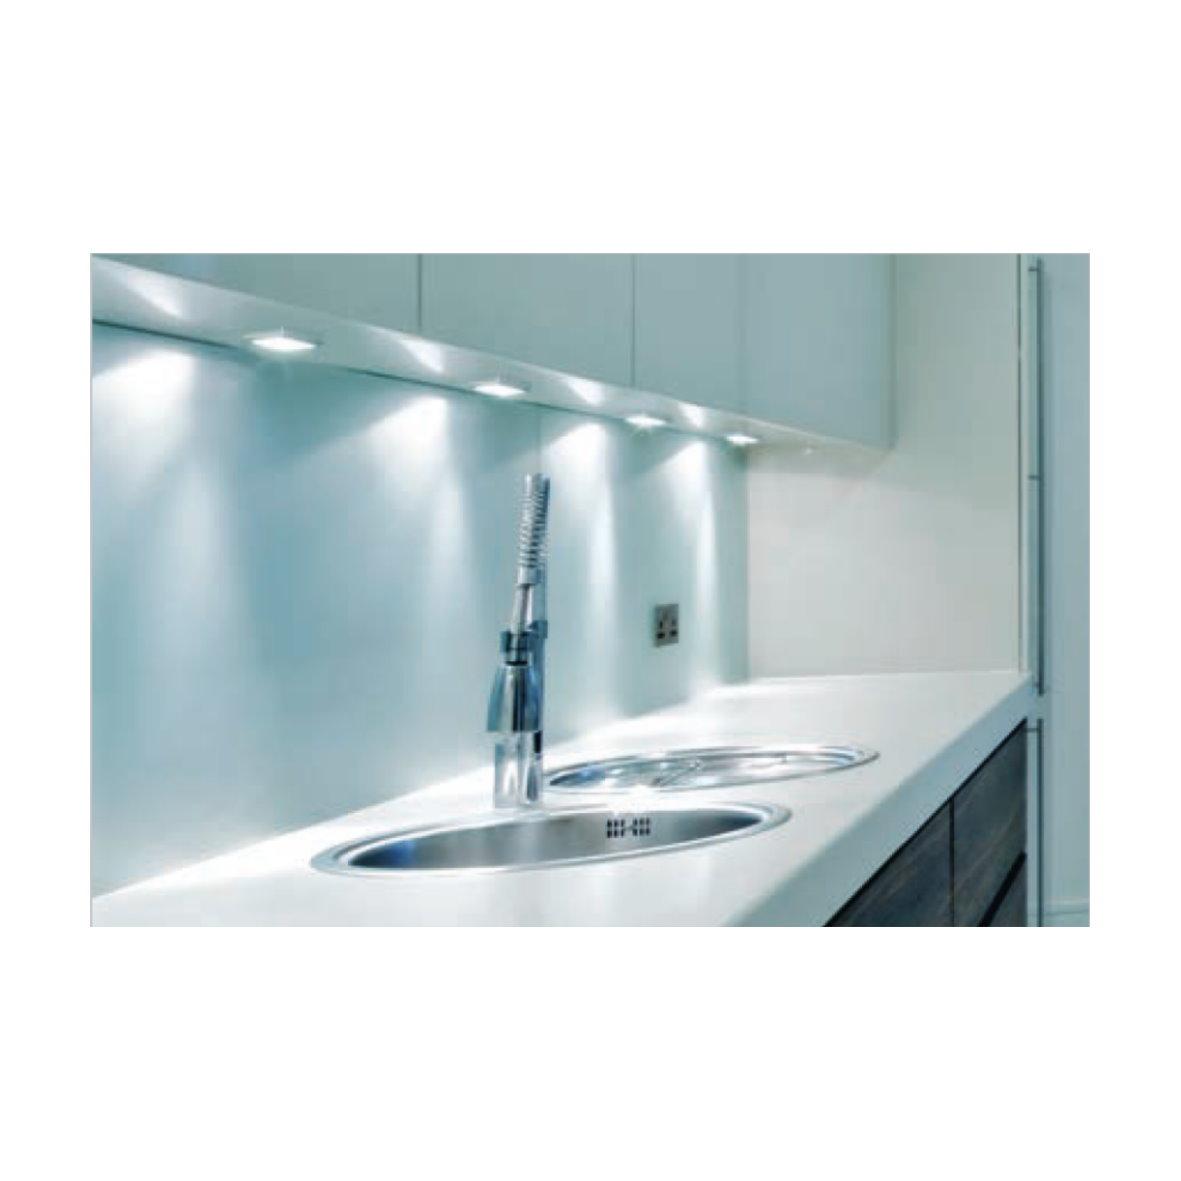 led aufbauleuchte alu lampe m bel k che aufbau unterbau leuchte strahler click ebay. Black Bedroom Furniture Sets. Home Design Ideas